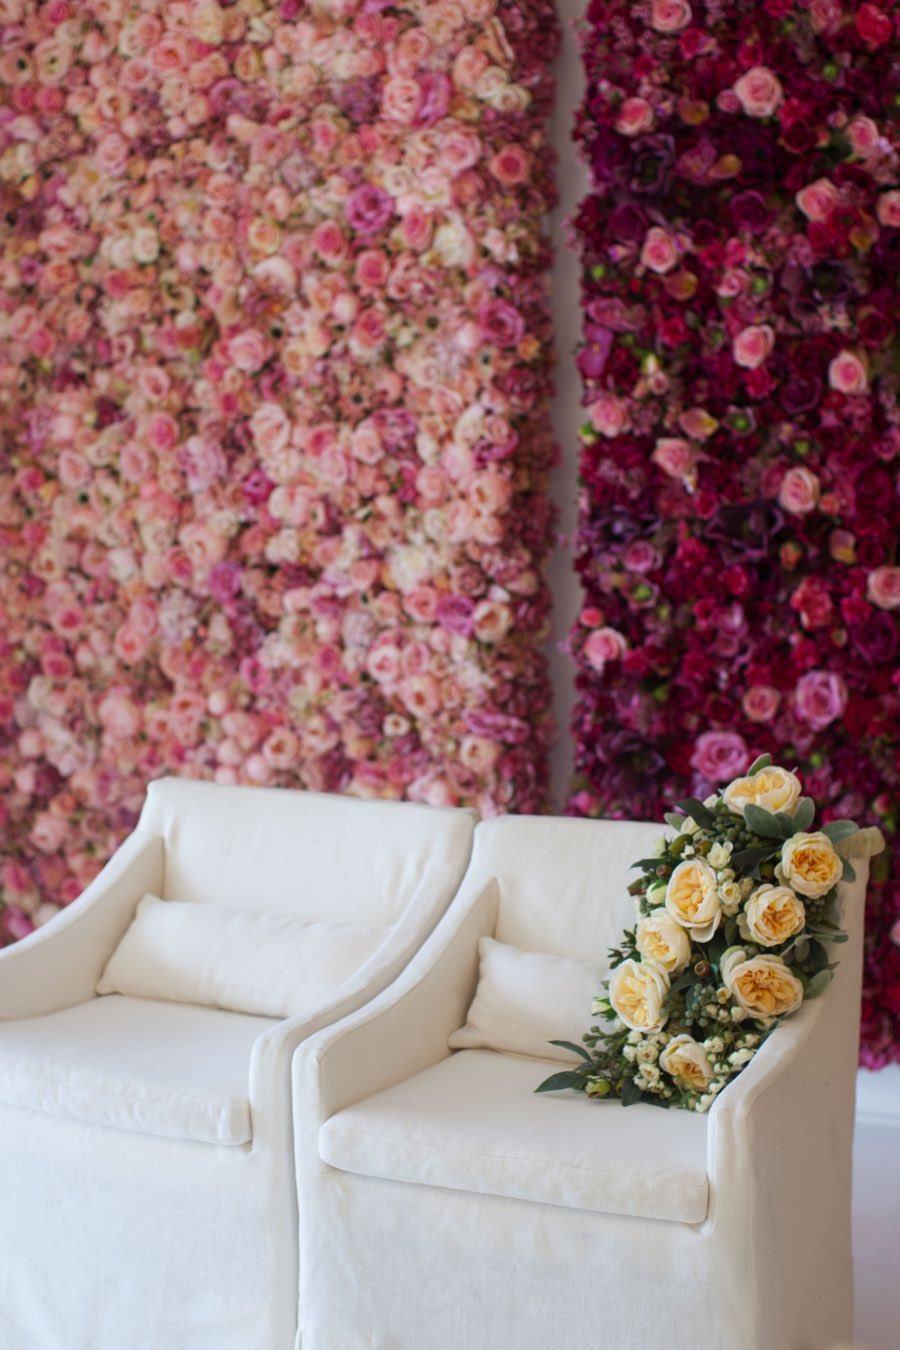 nicol-floral-design-showroom-7